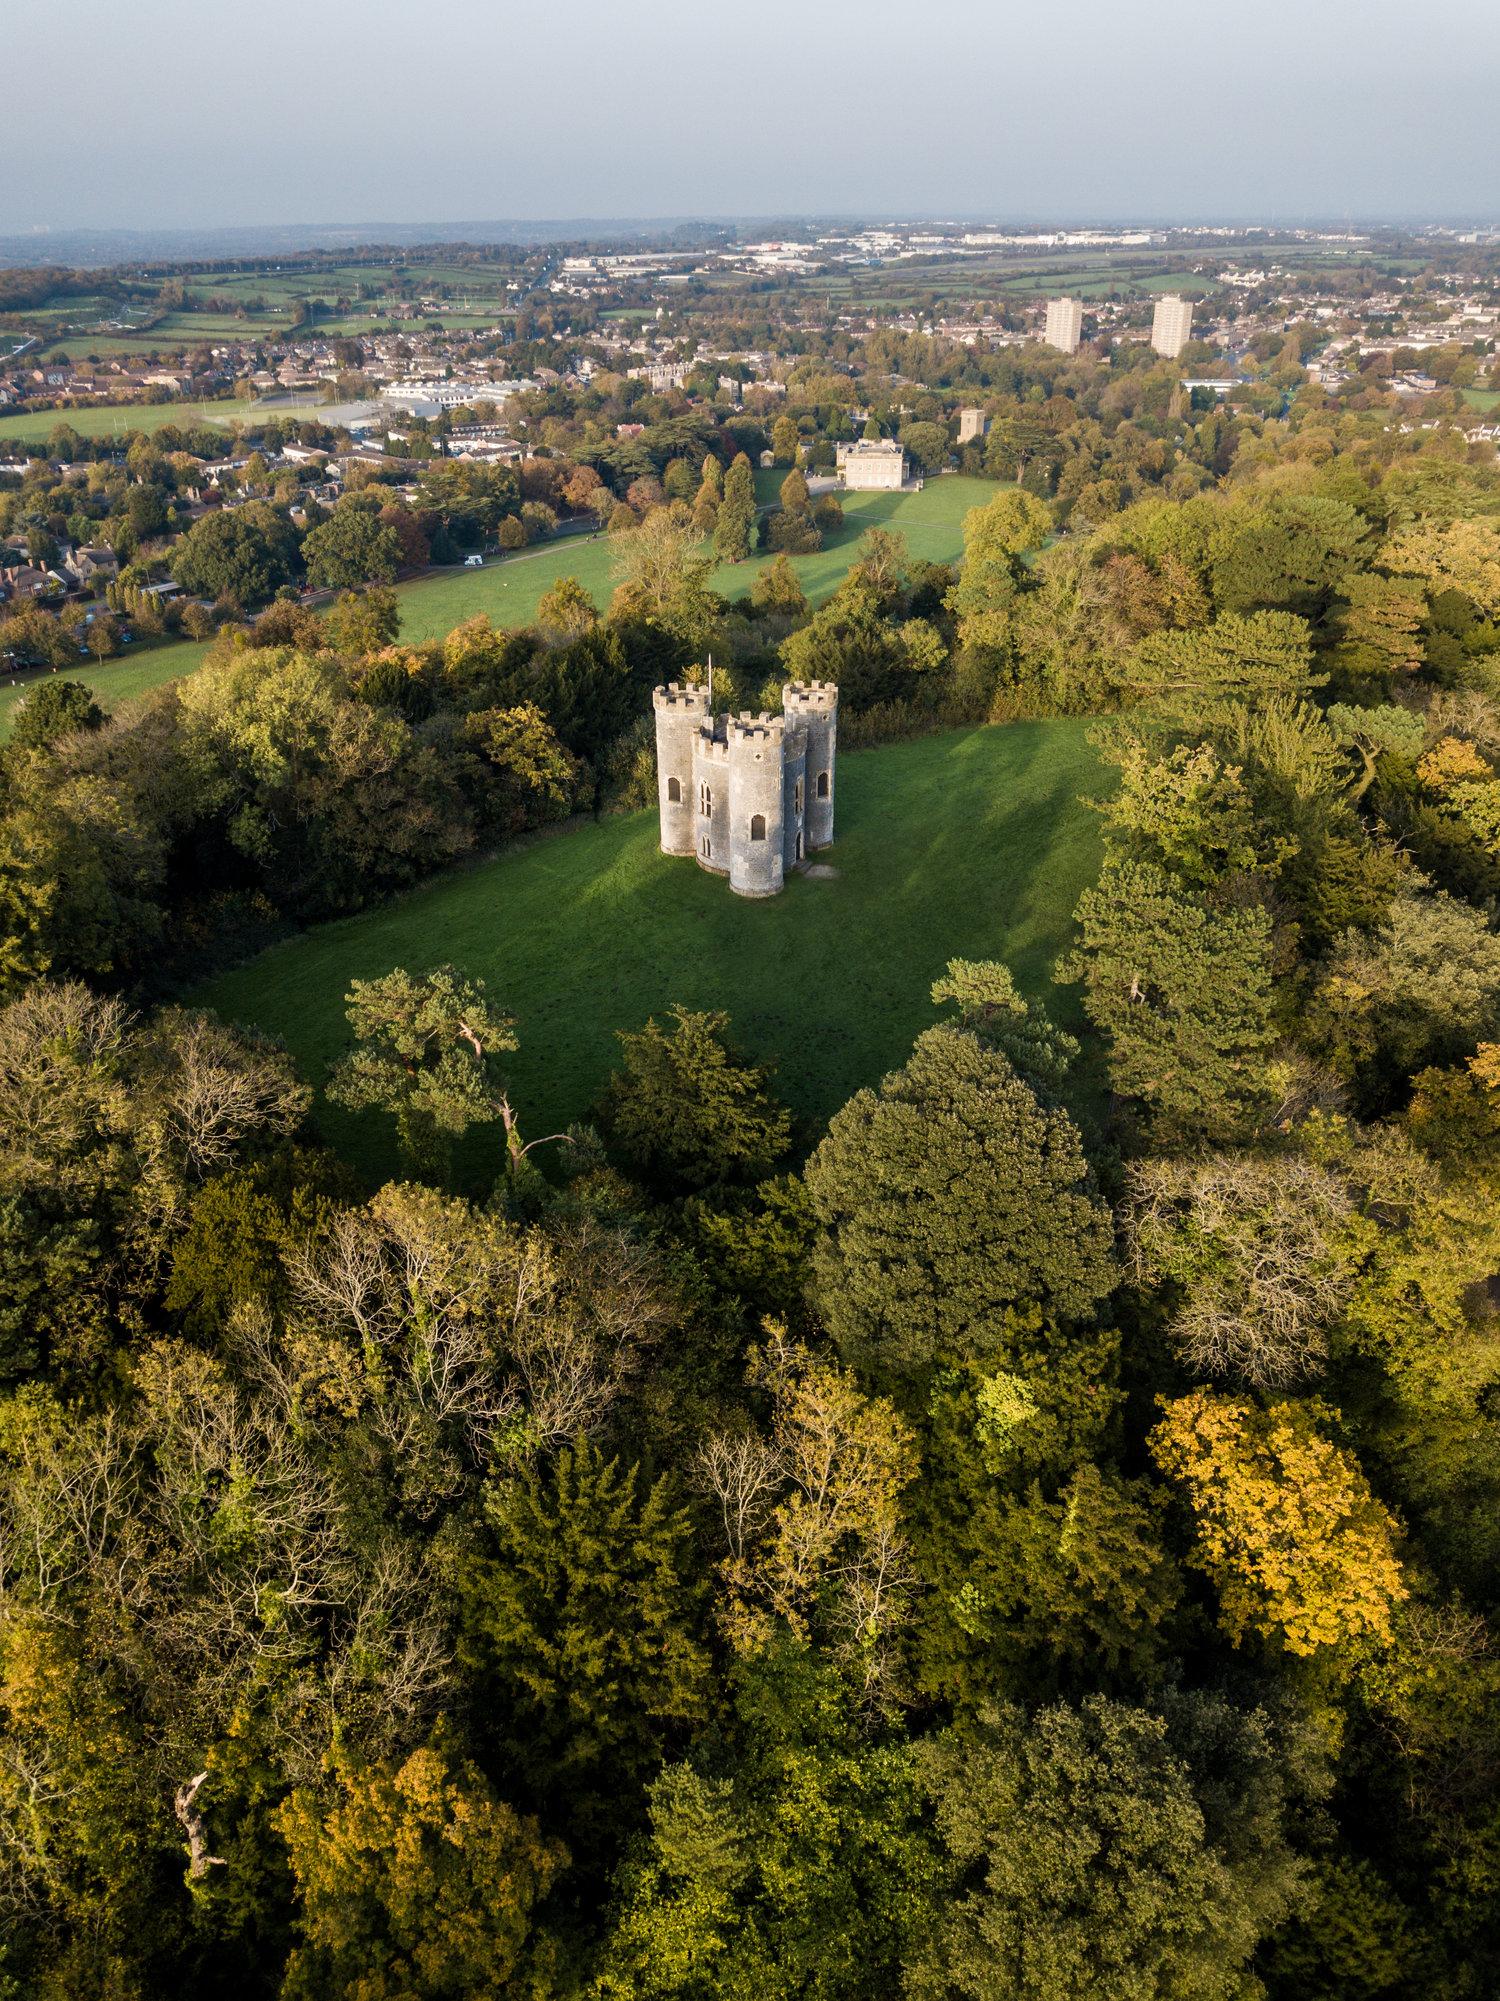 Blaise Castle, Bristol. Photo by Ryan Searle on Unsplash .